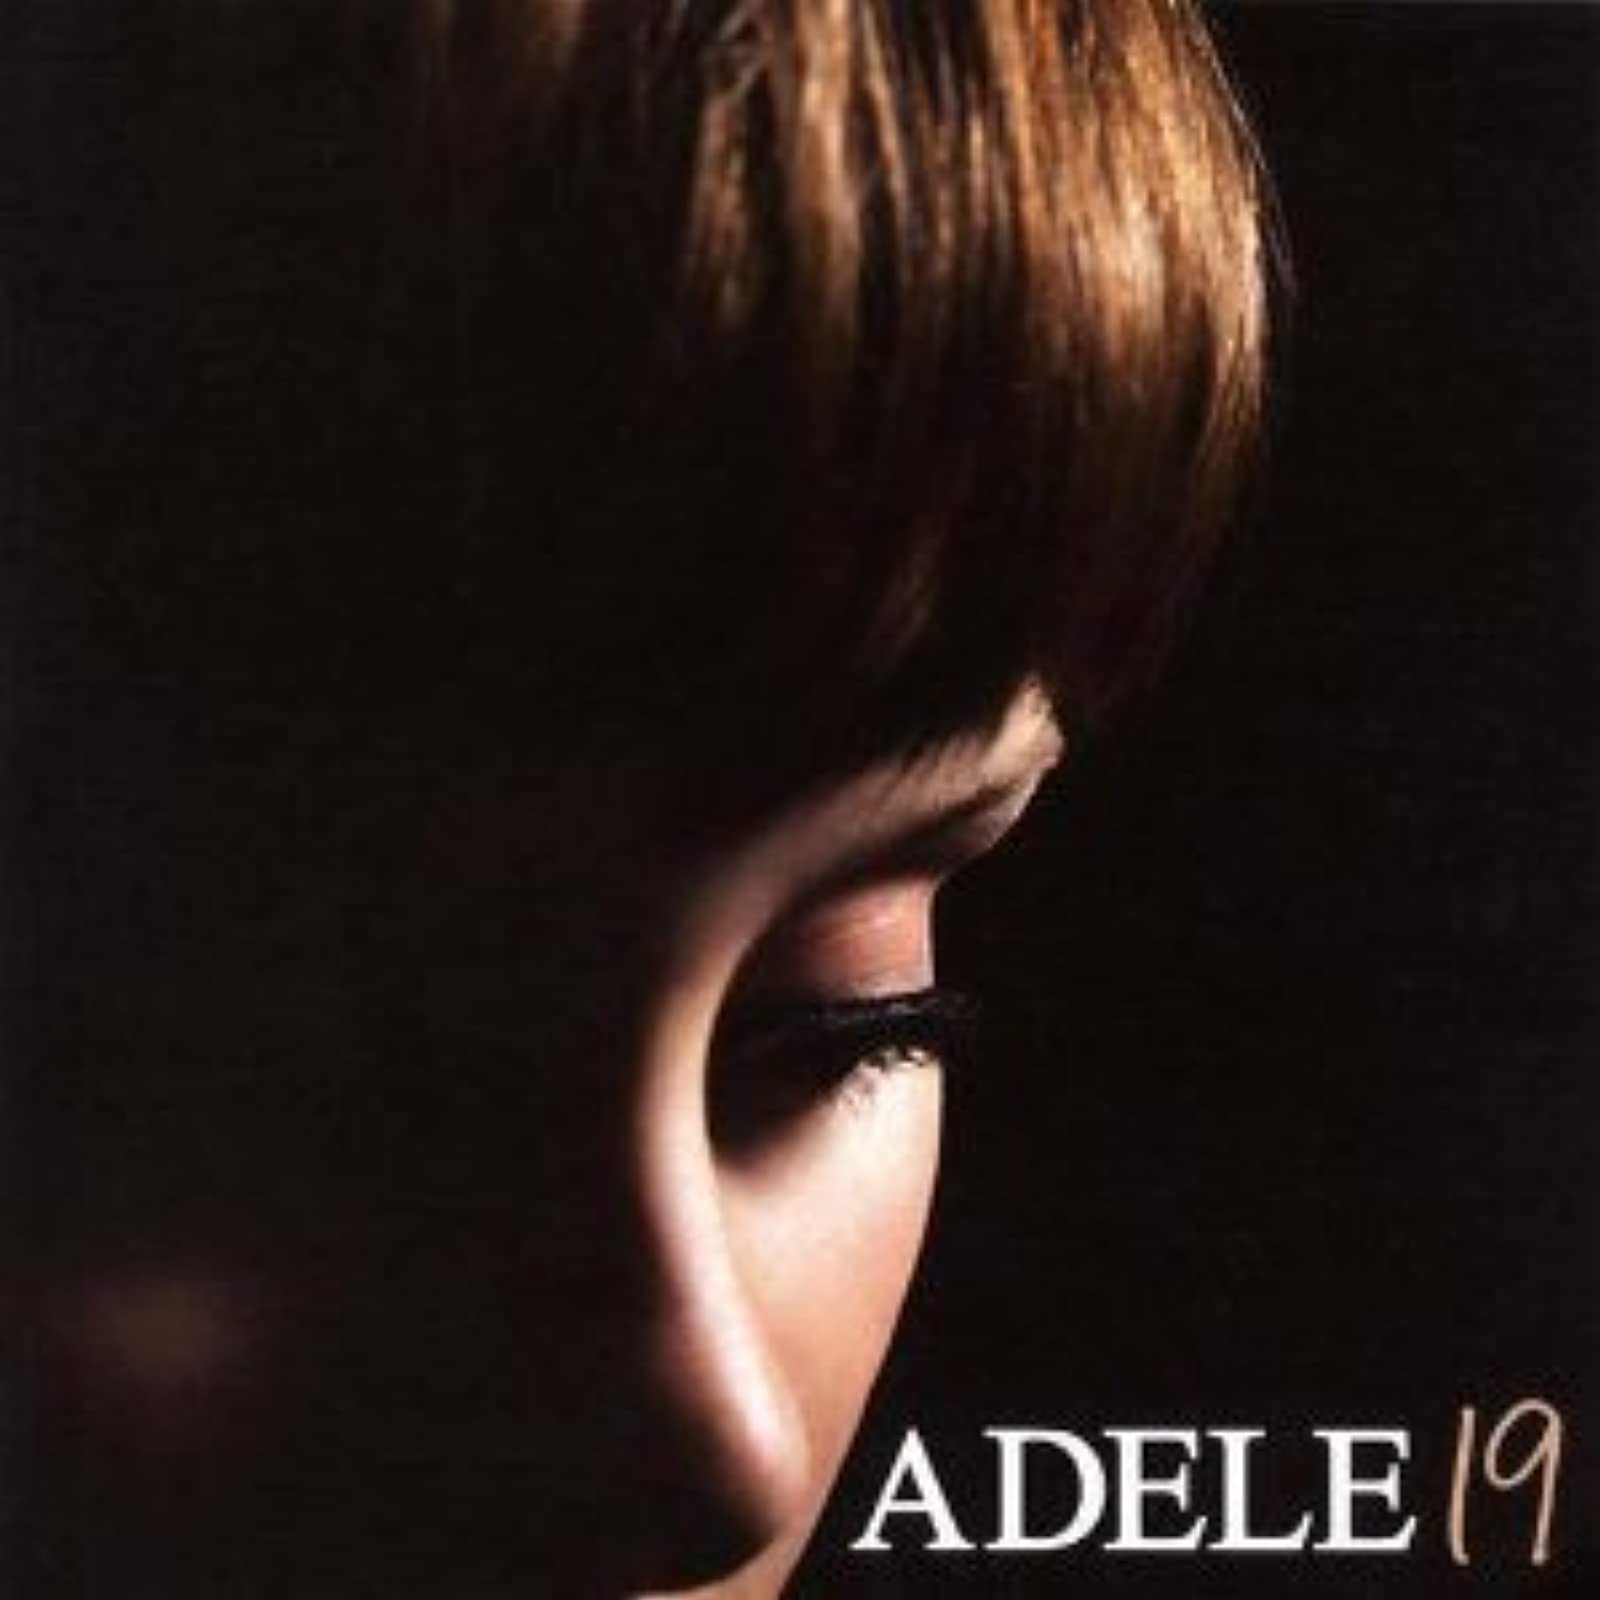 19 Adele Format: By Adele Artist On Audio CD Album 1996